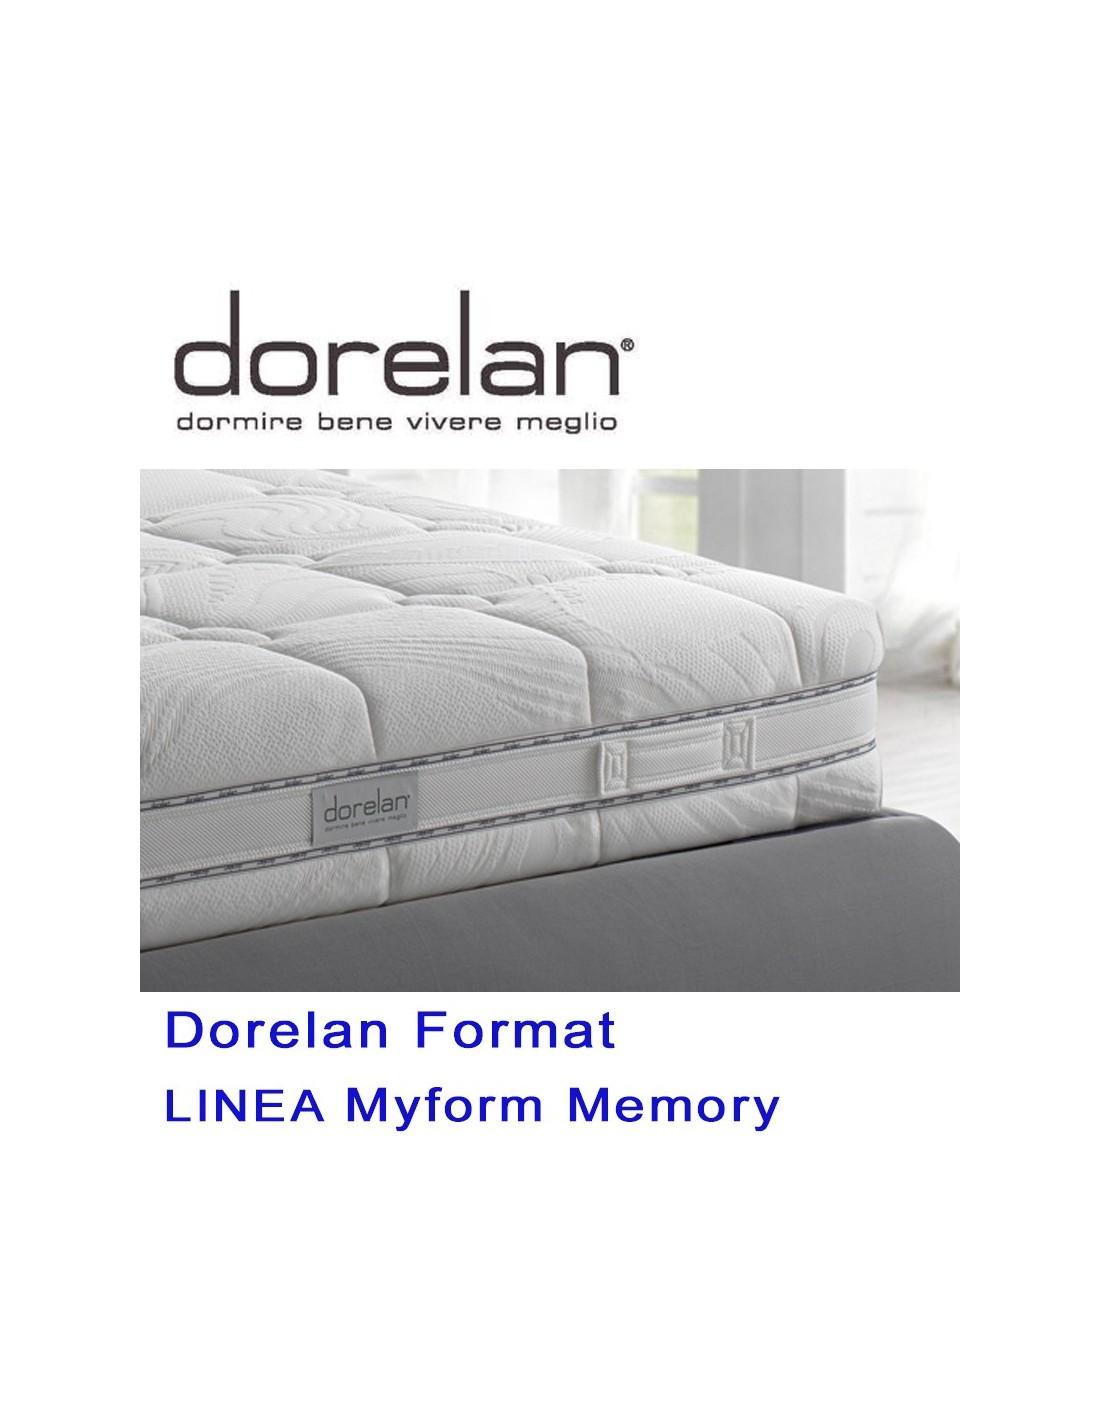 Myform Memory Dorelan Format